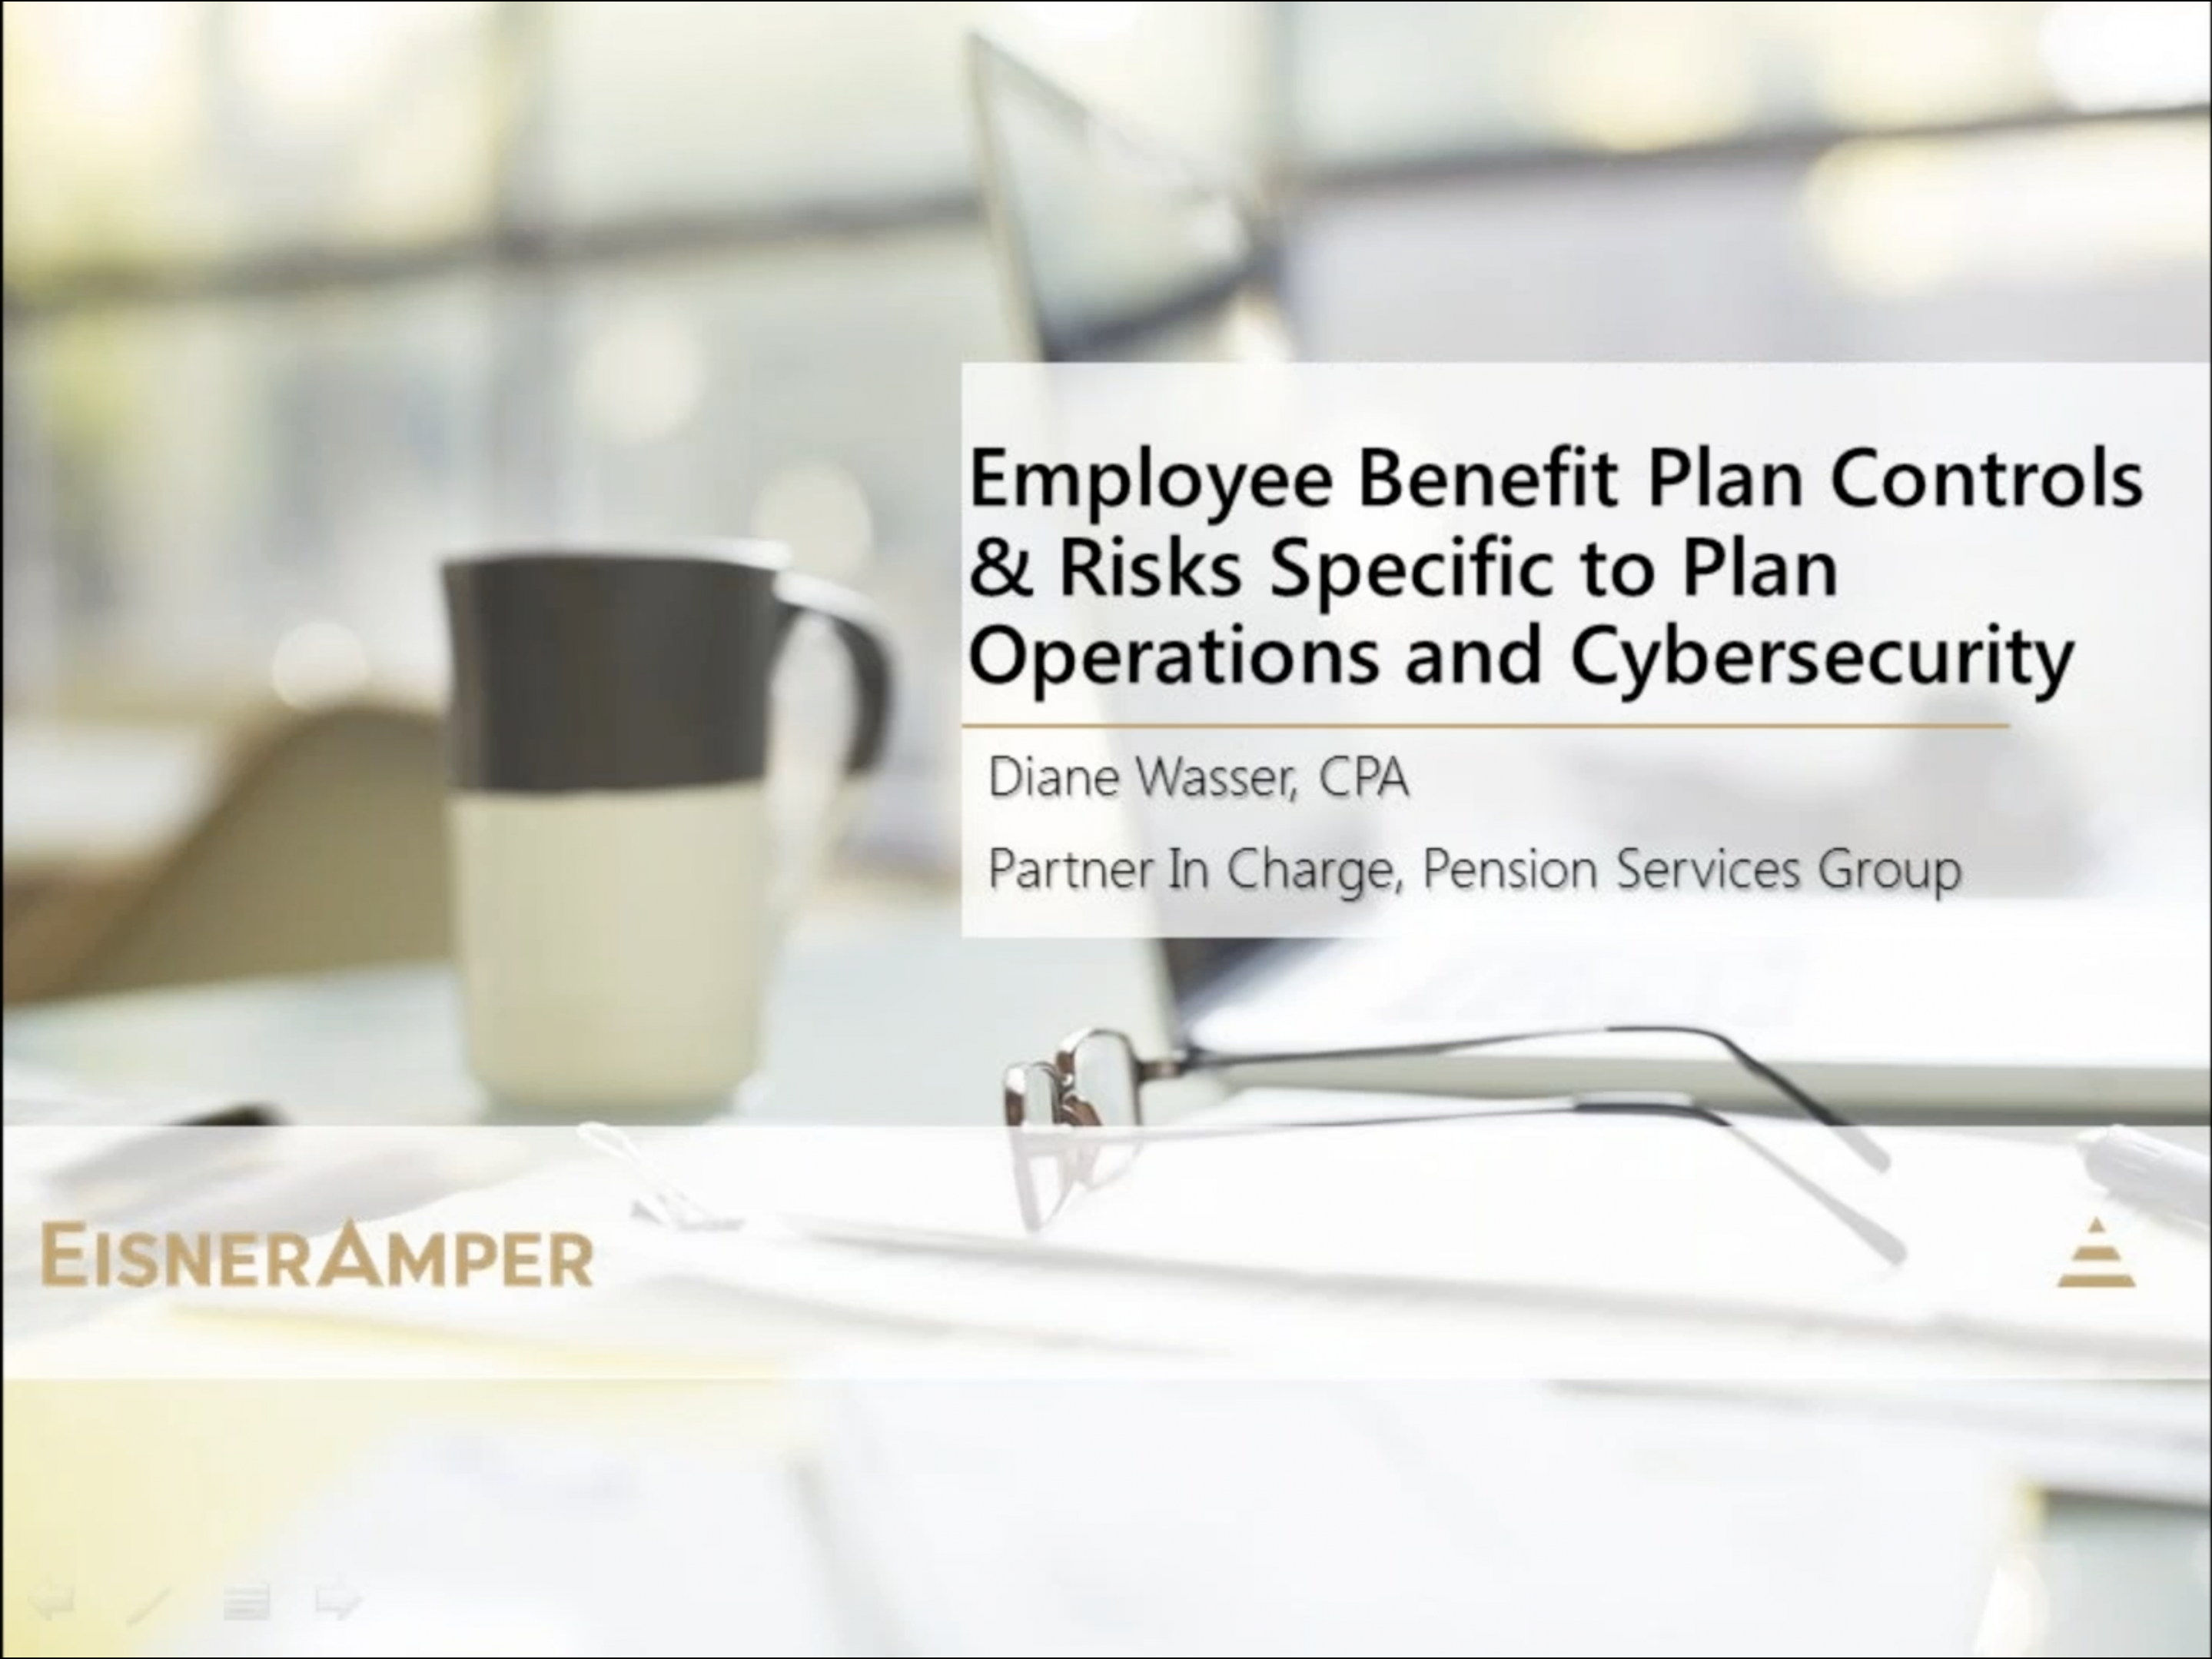 Employee Benefit Plan Controls